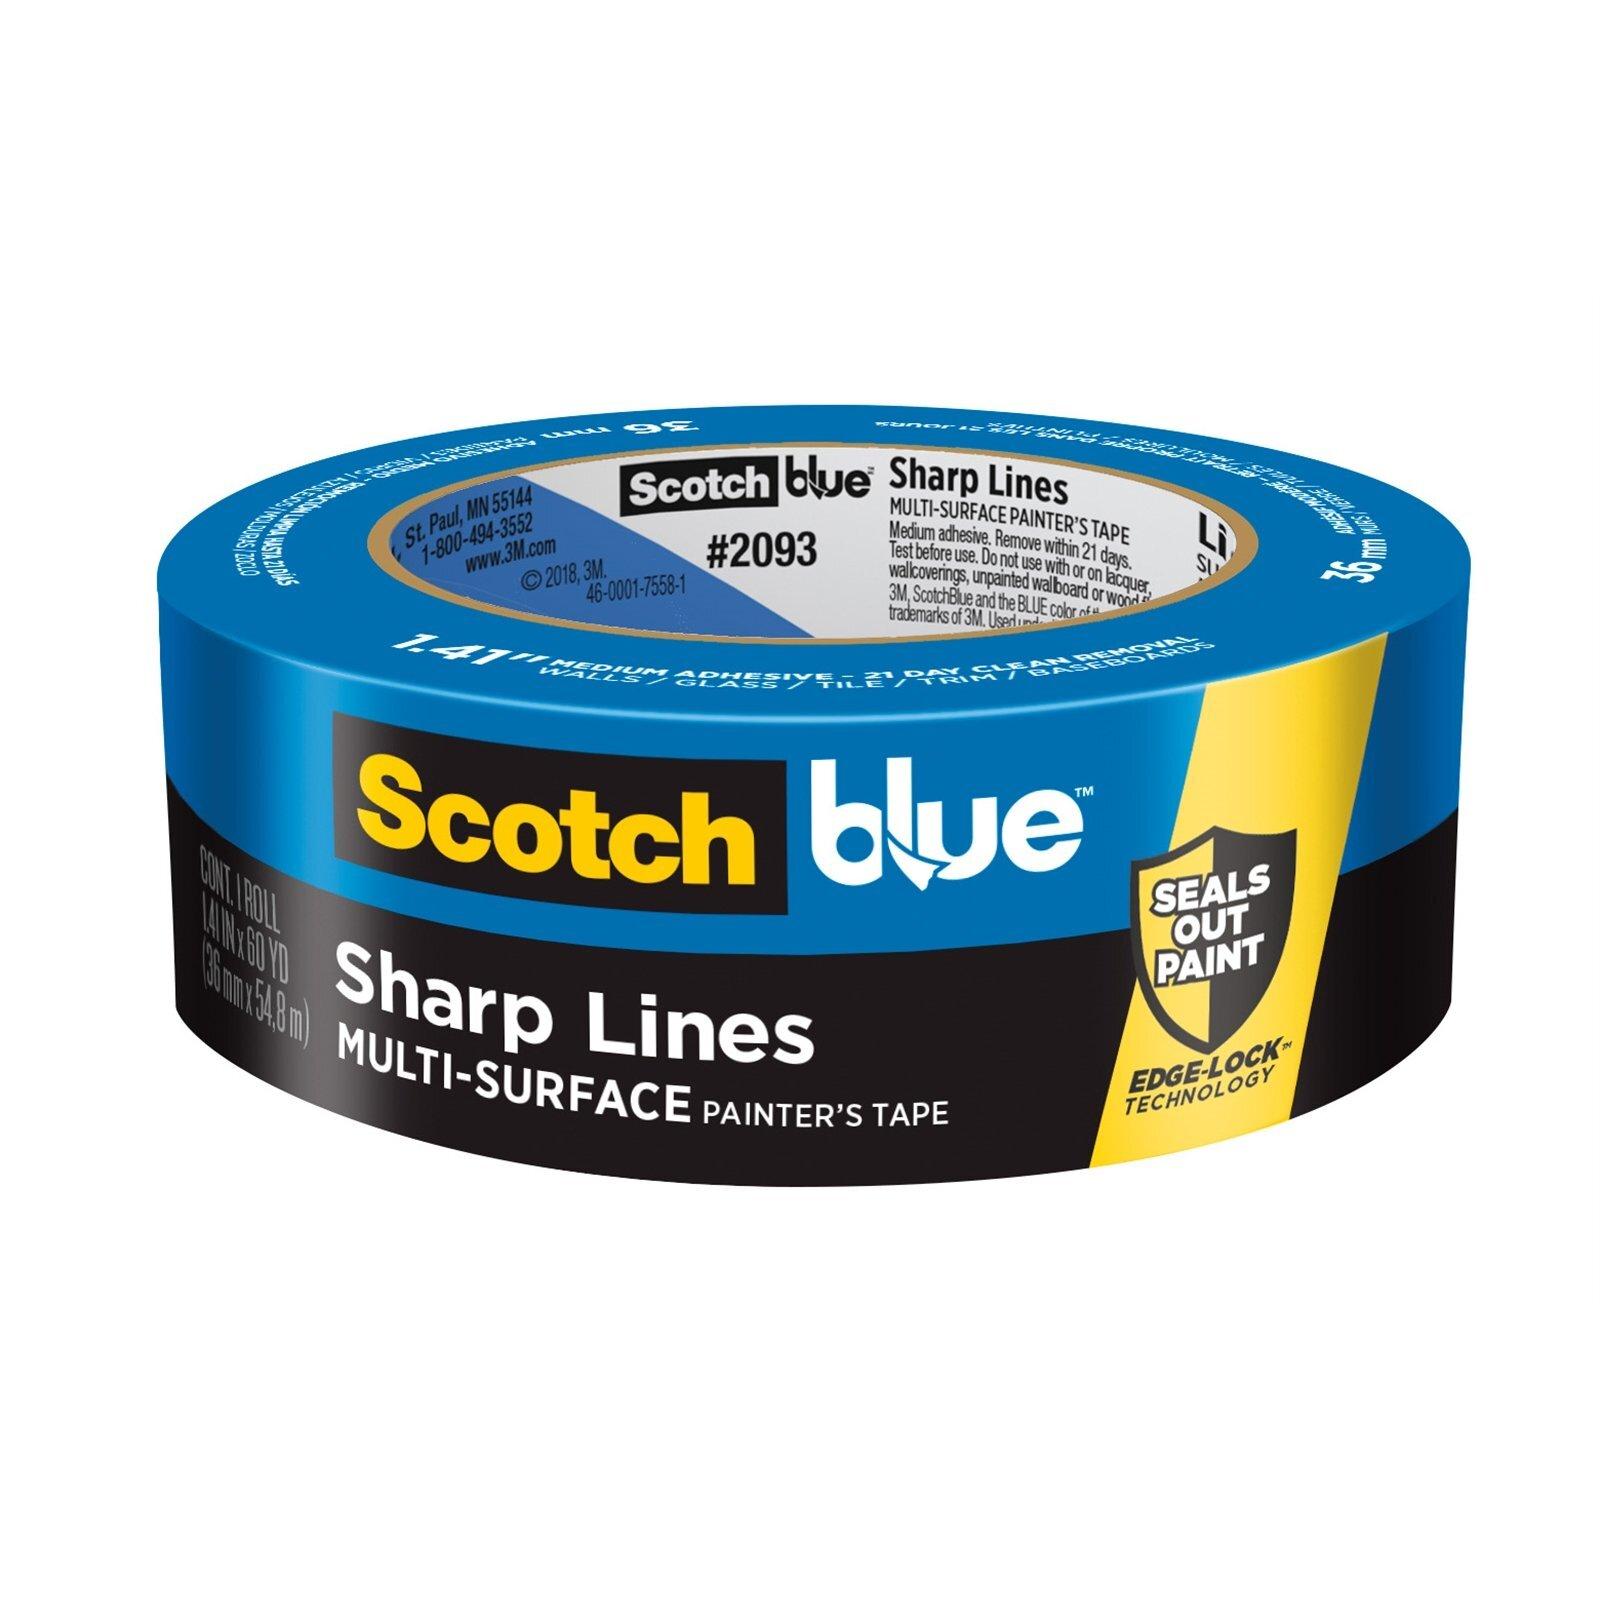 ScotchBlue 36mm x 55m Sharp Lines Multi-Surface Painter's Masking Tape